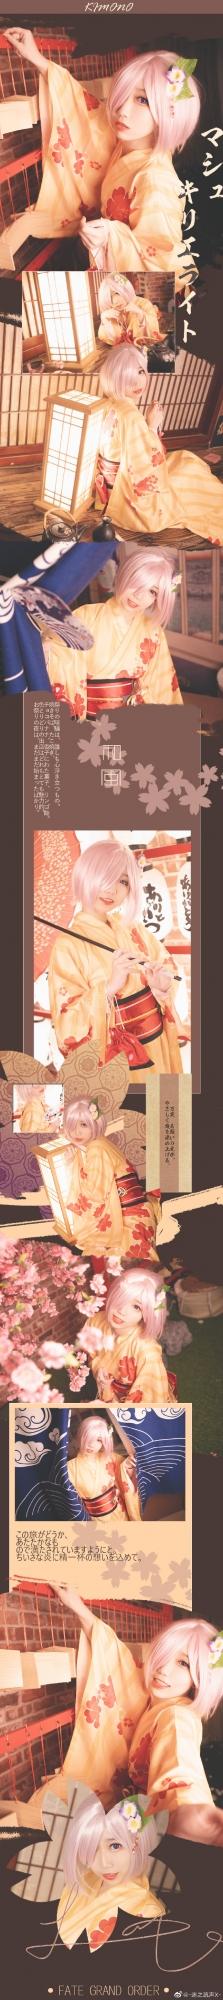 [COS]Fate/GrandOrder   玛修·基列莱特   和服   @-貂蝉cosplay图片服装迷之疏声X- (9P) –插图